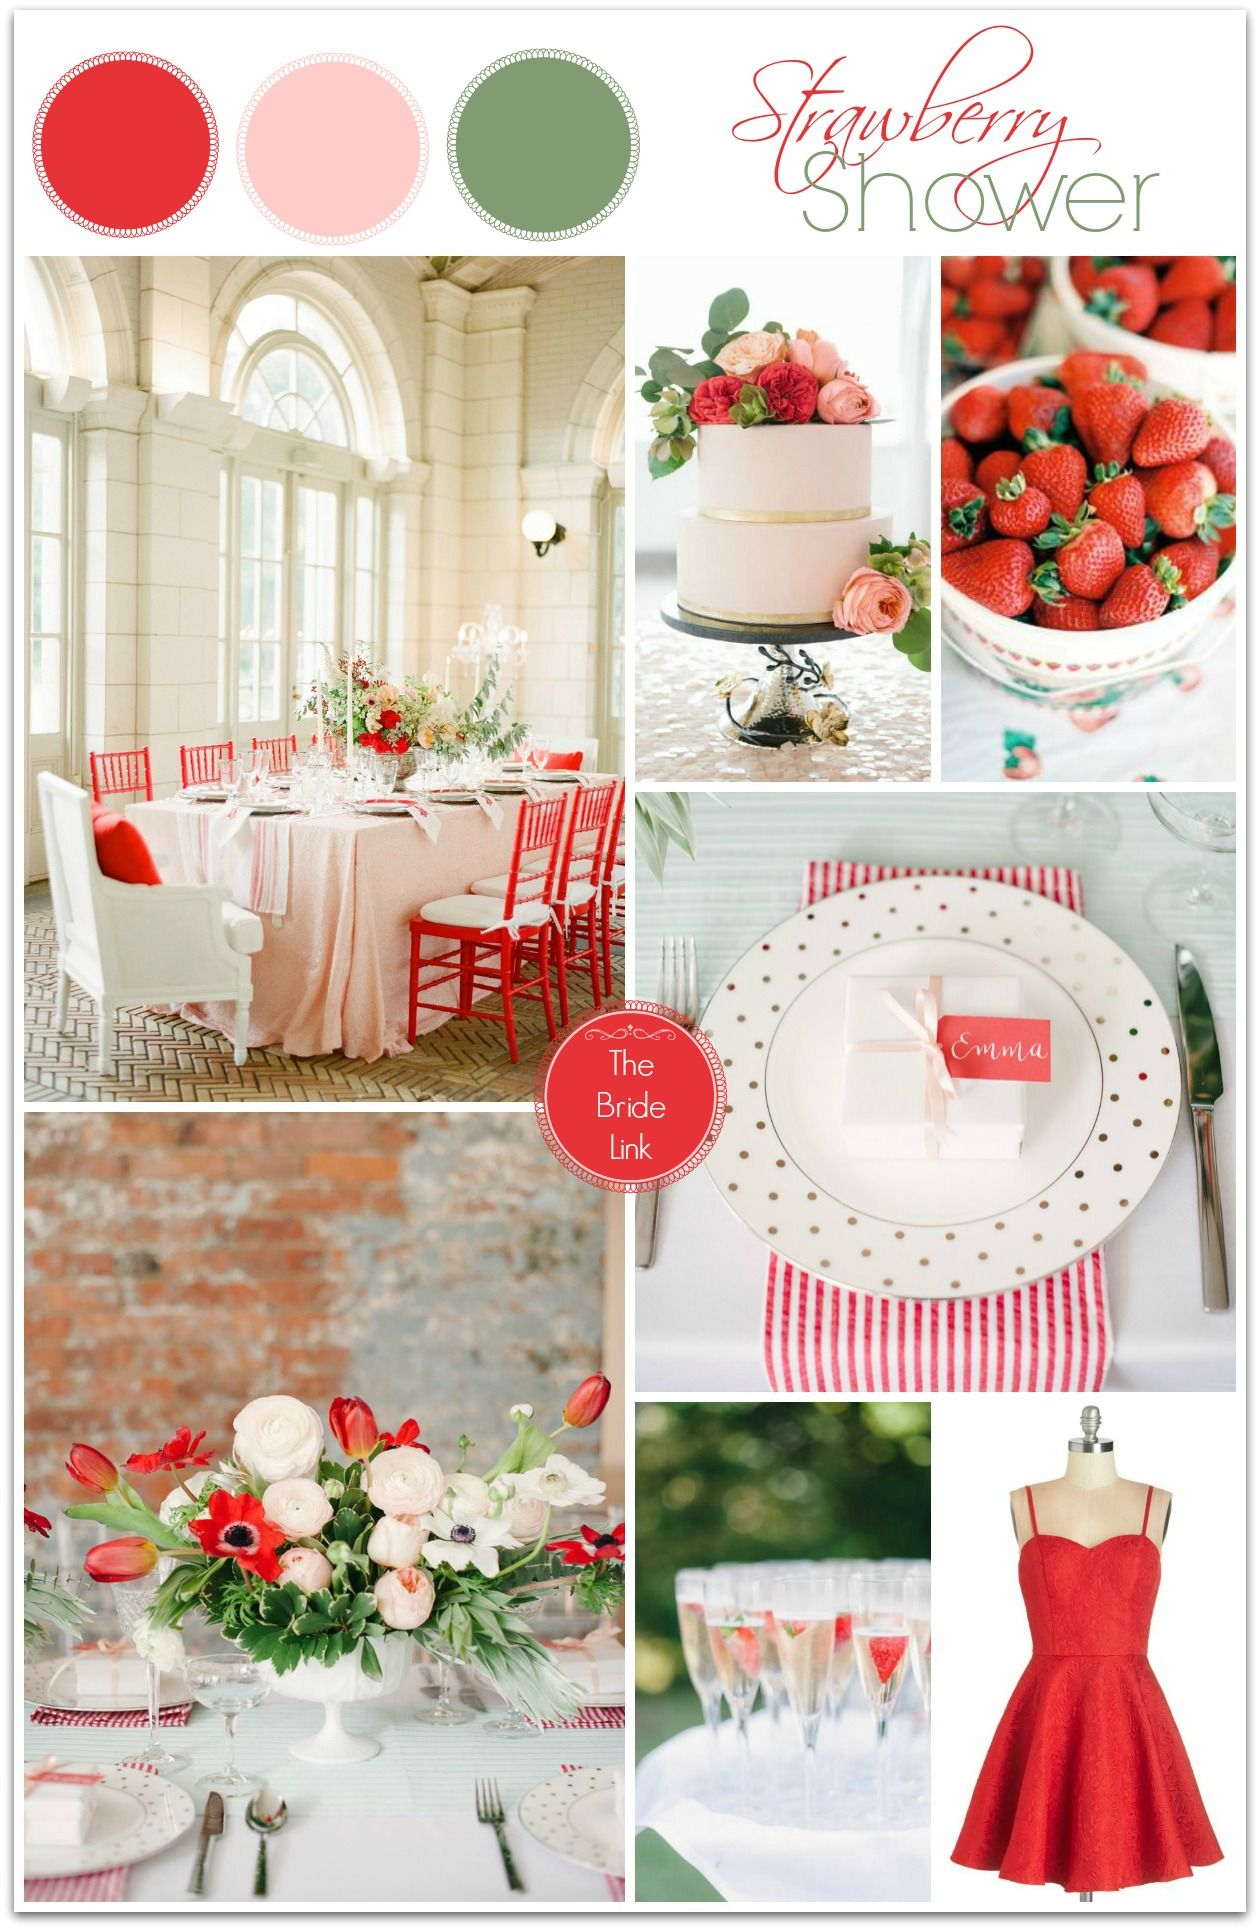 Strawberry Wedding Shower Inspiration